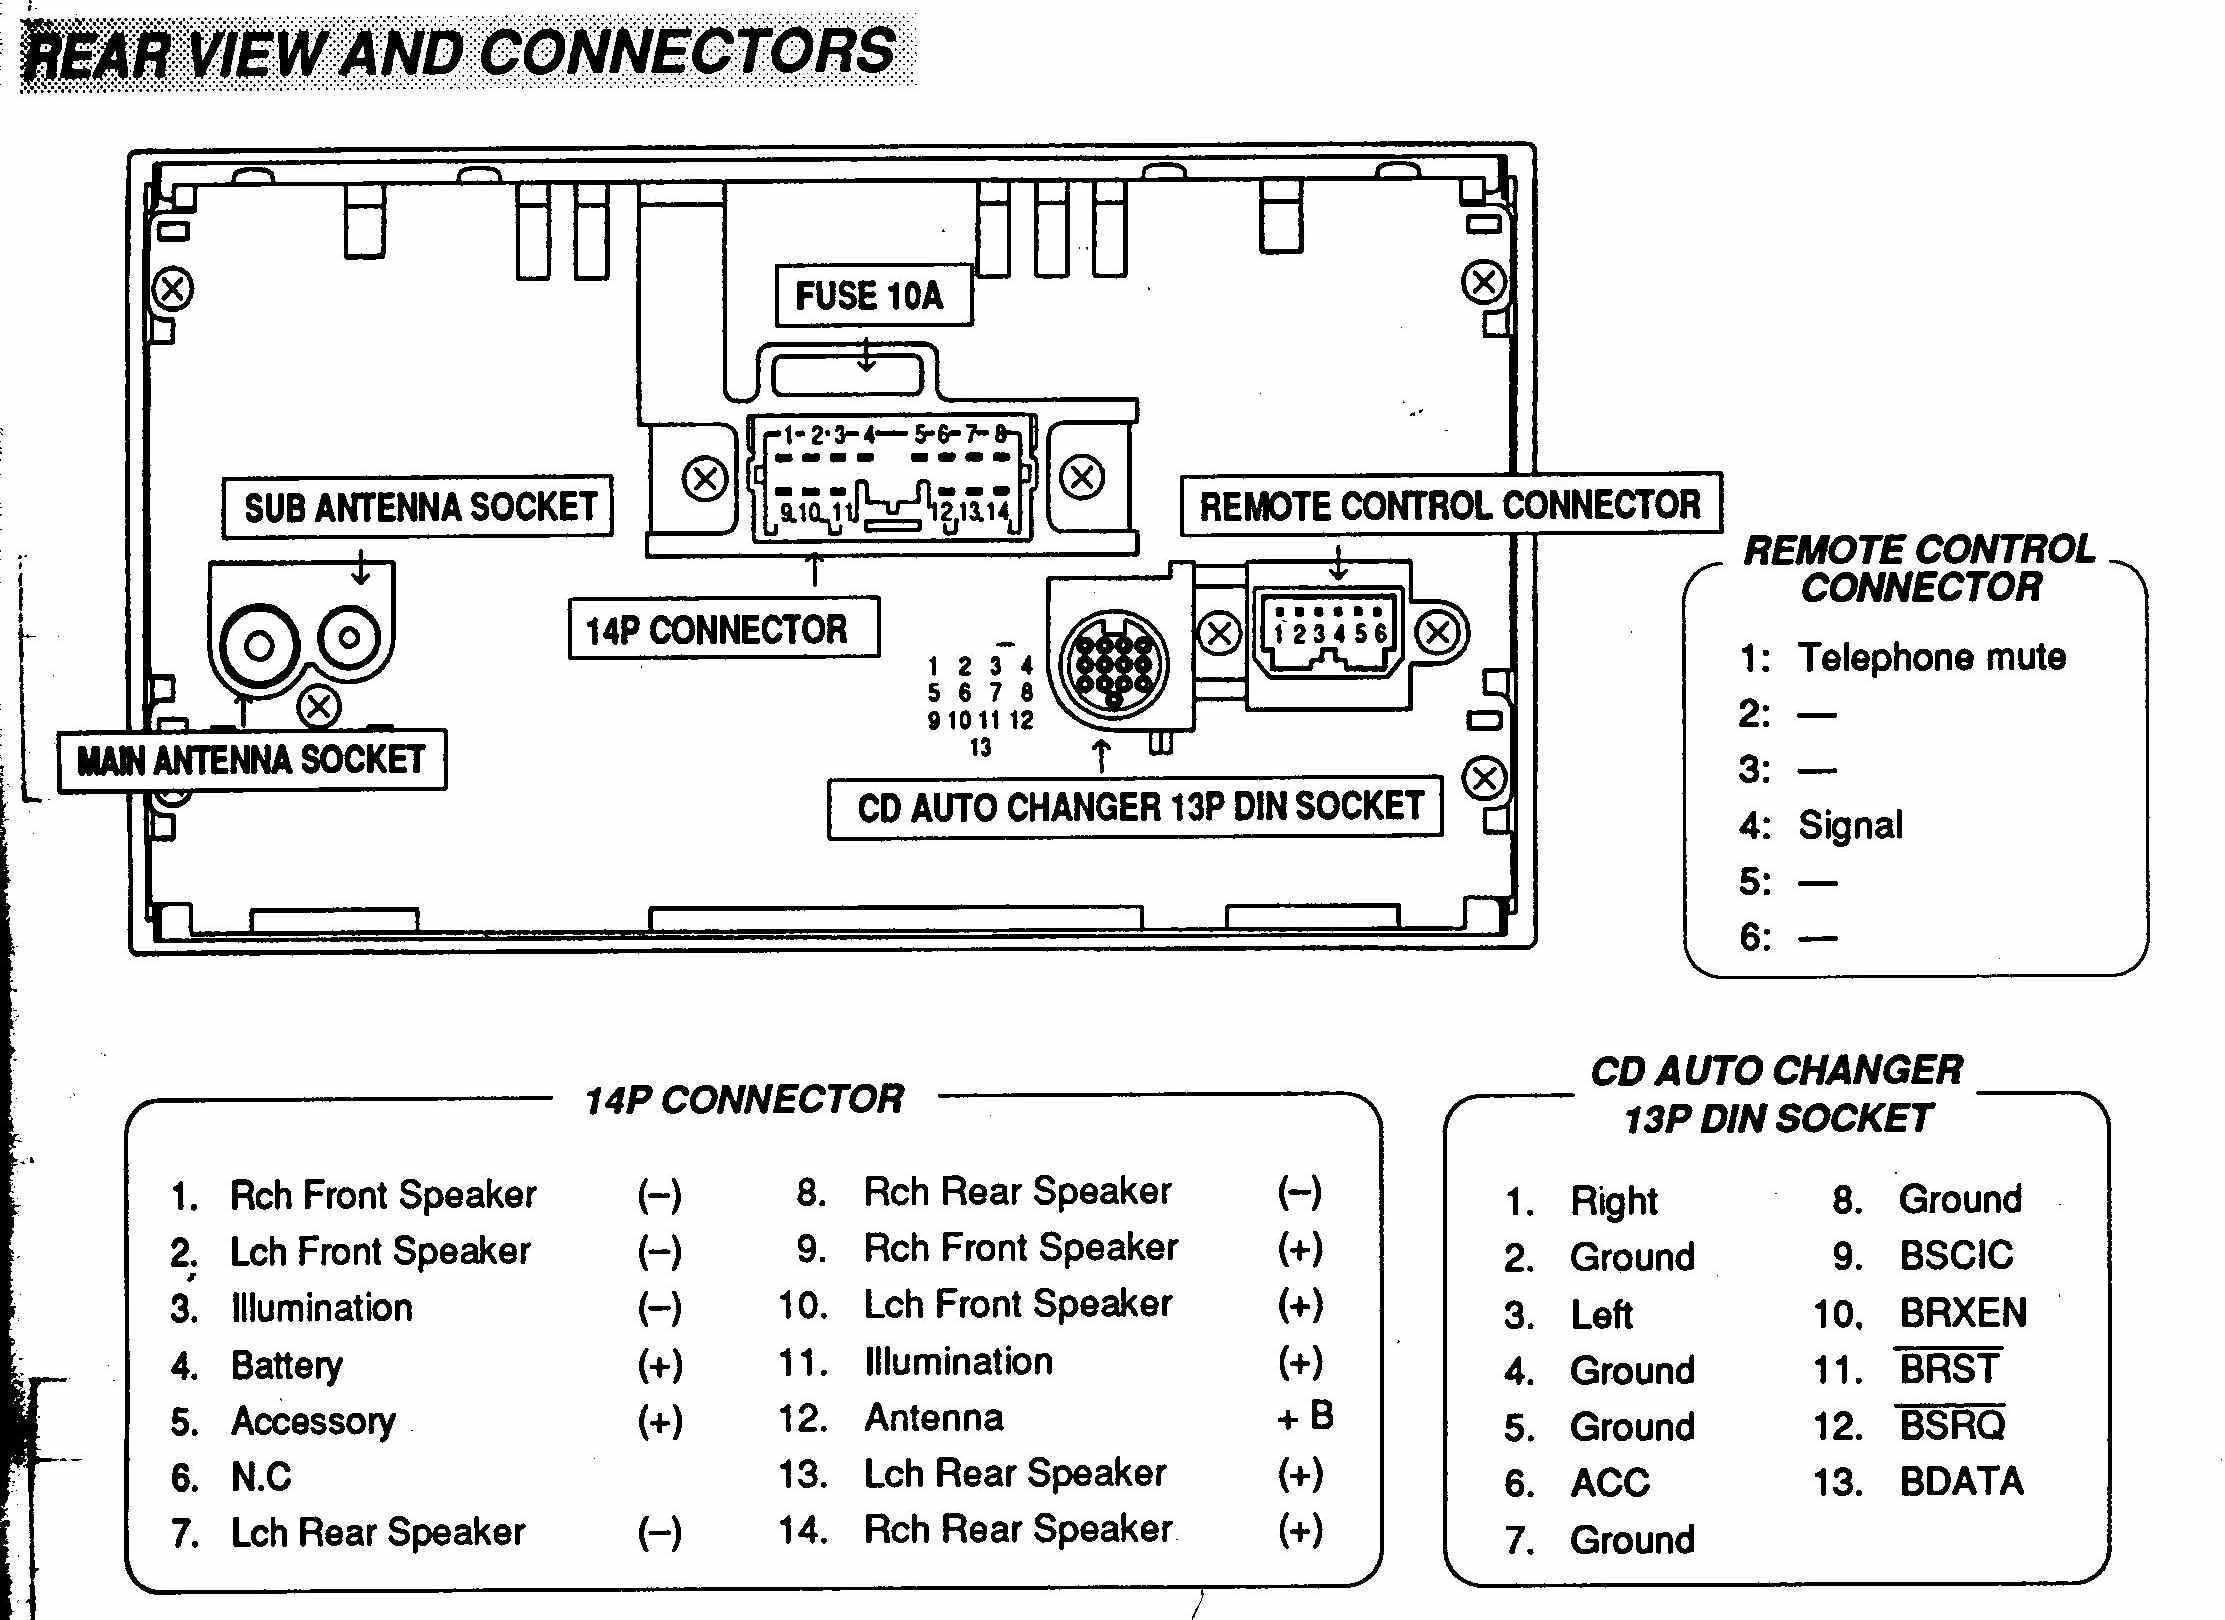 Mitsubishi Galant Engine Diagram Wiring Diagram Moreover 2001 Mitsubishi Eclipse Radio Wiring Diagram Of Mitsubishi Galant Engine Diagram